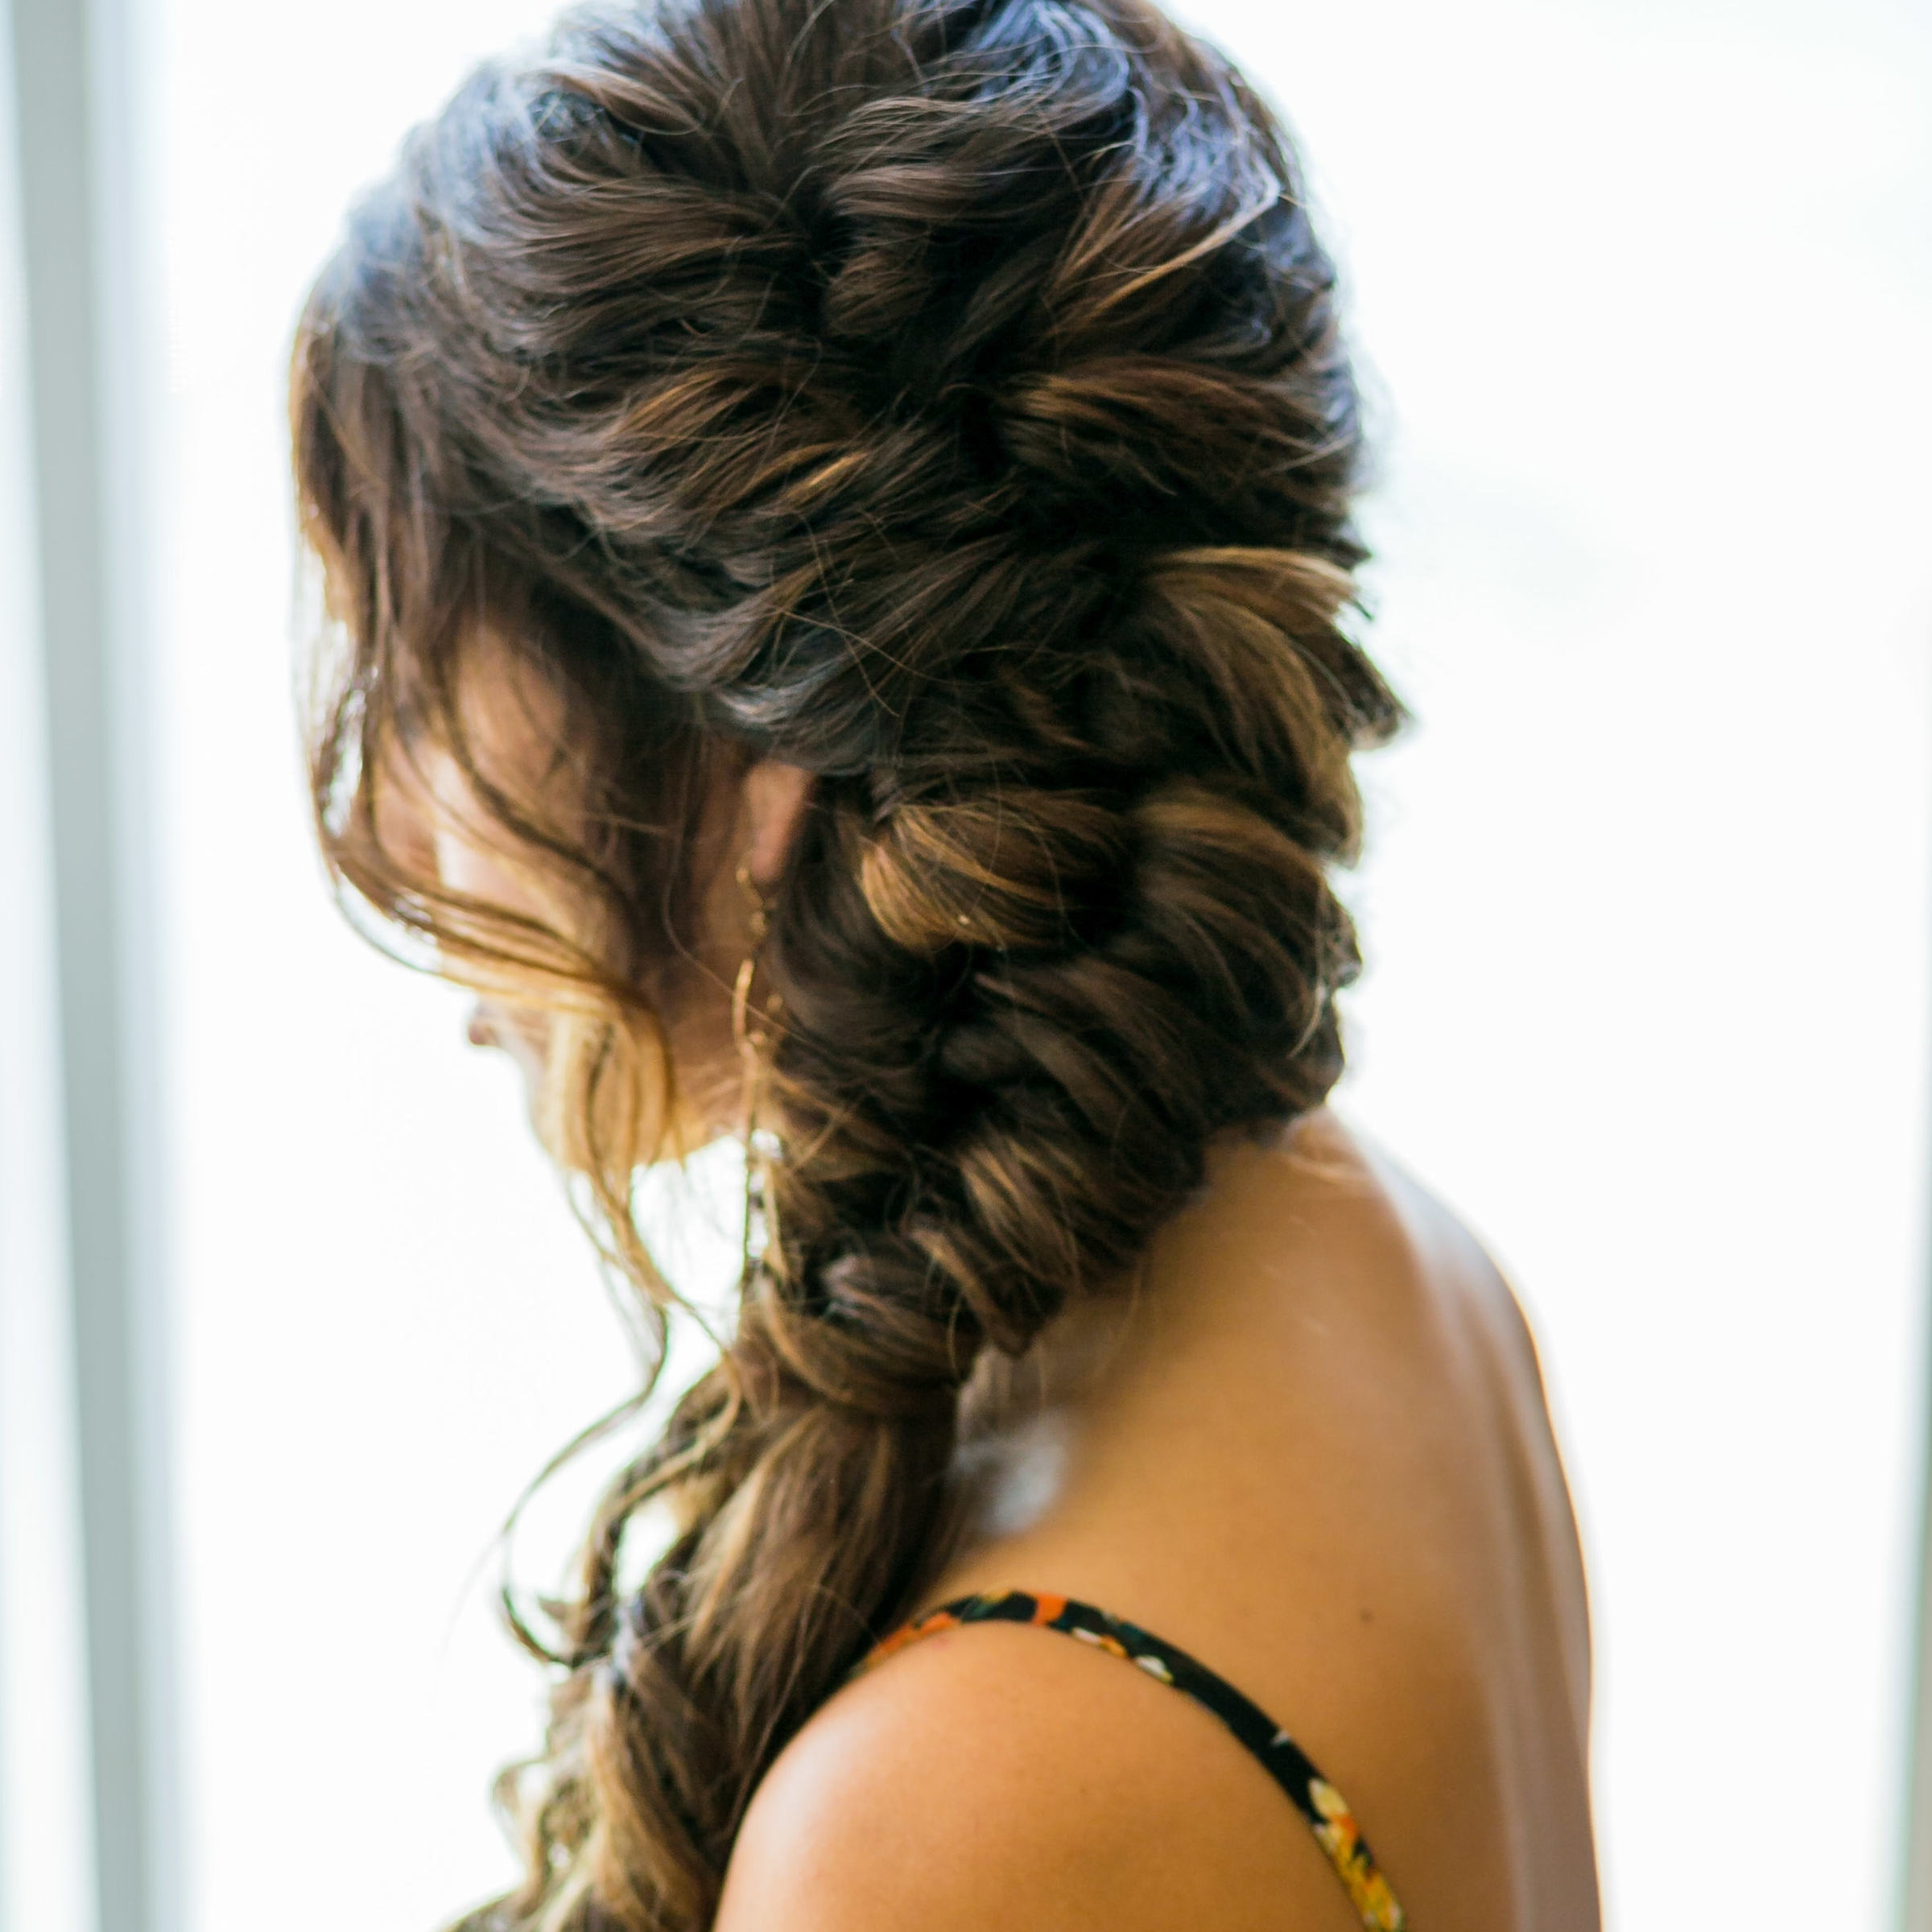 Orange county bridal hair stylist | Braided hair style ideas